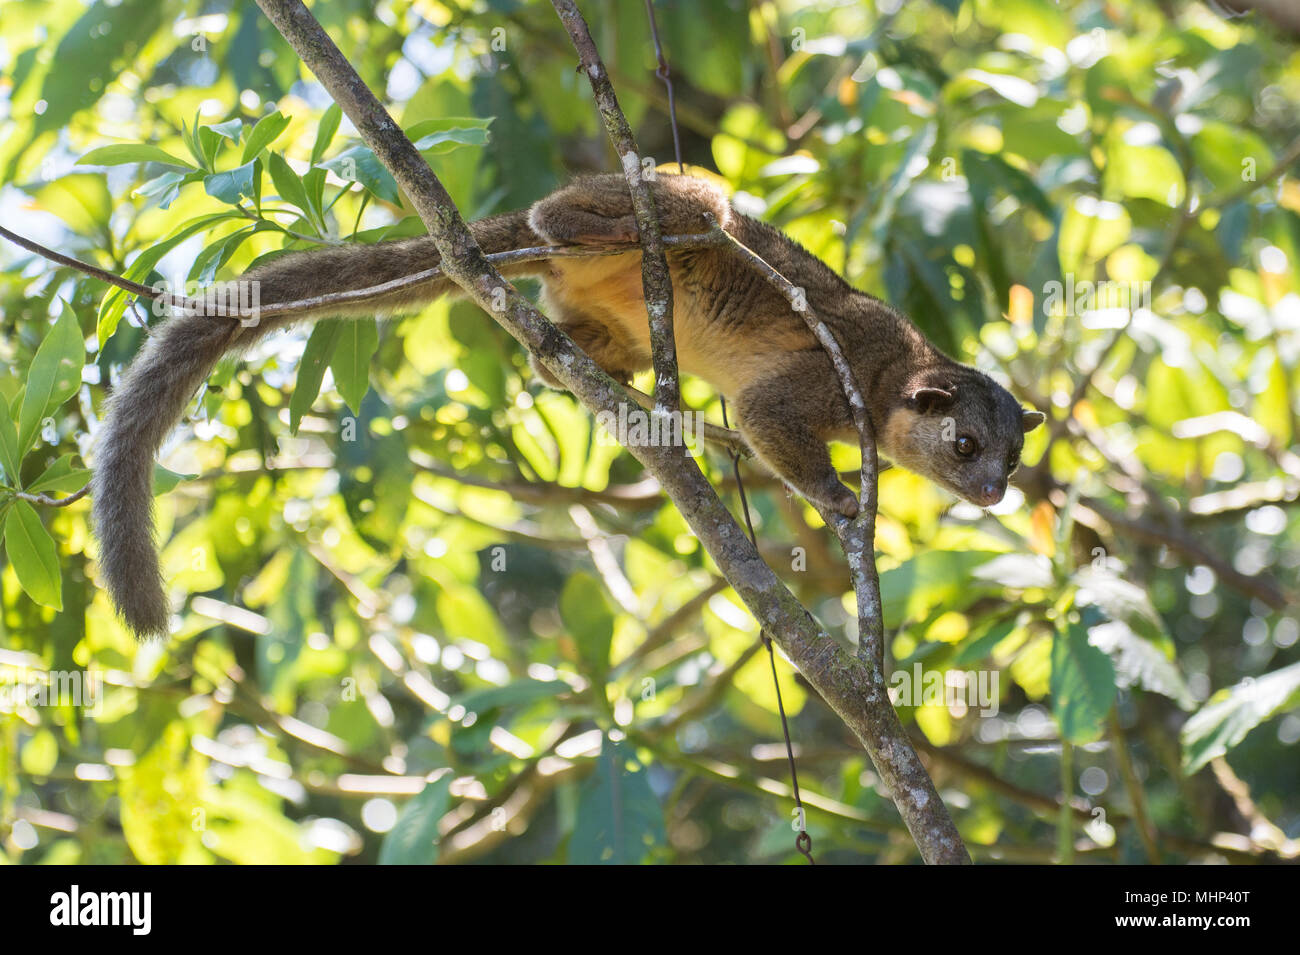 Kinkajou, Potus flavus, Procyonidae, Monteverde Cloud Forest Reserve, Costa Rica, Centroamerica - Stock Image